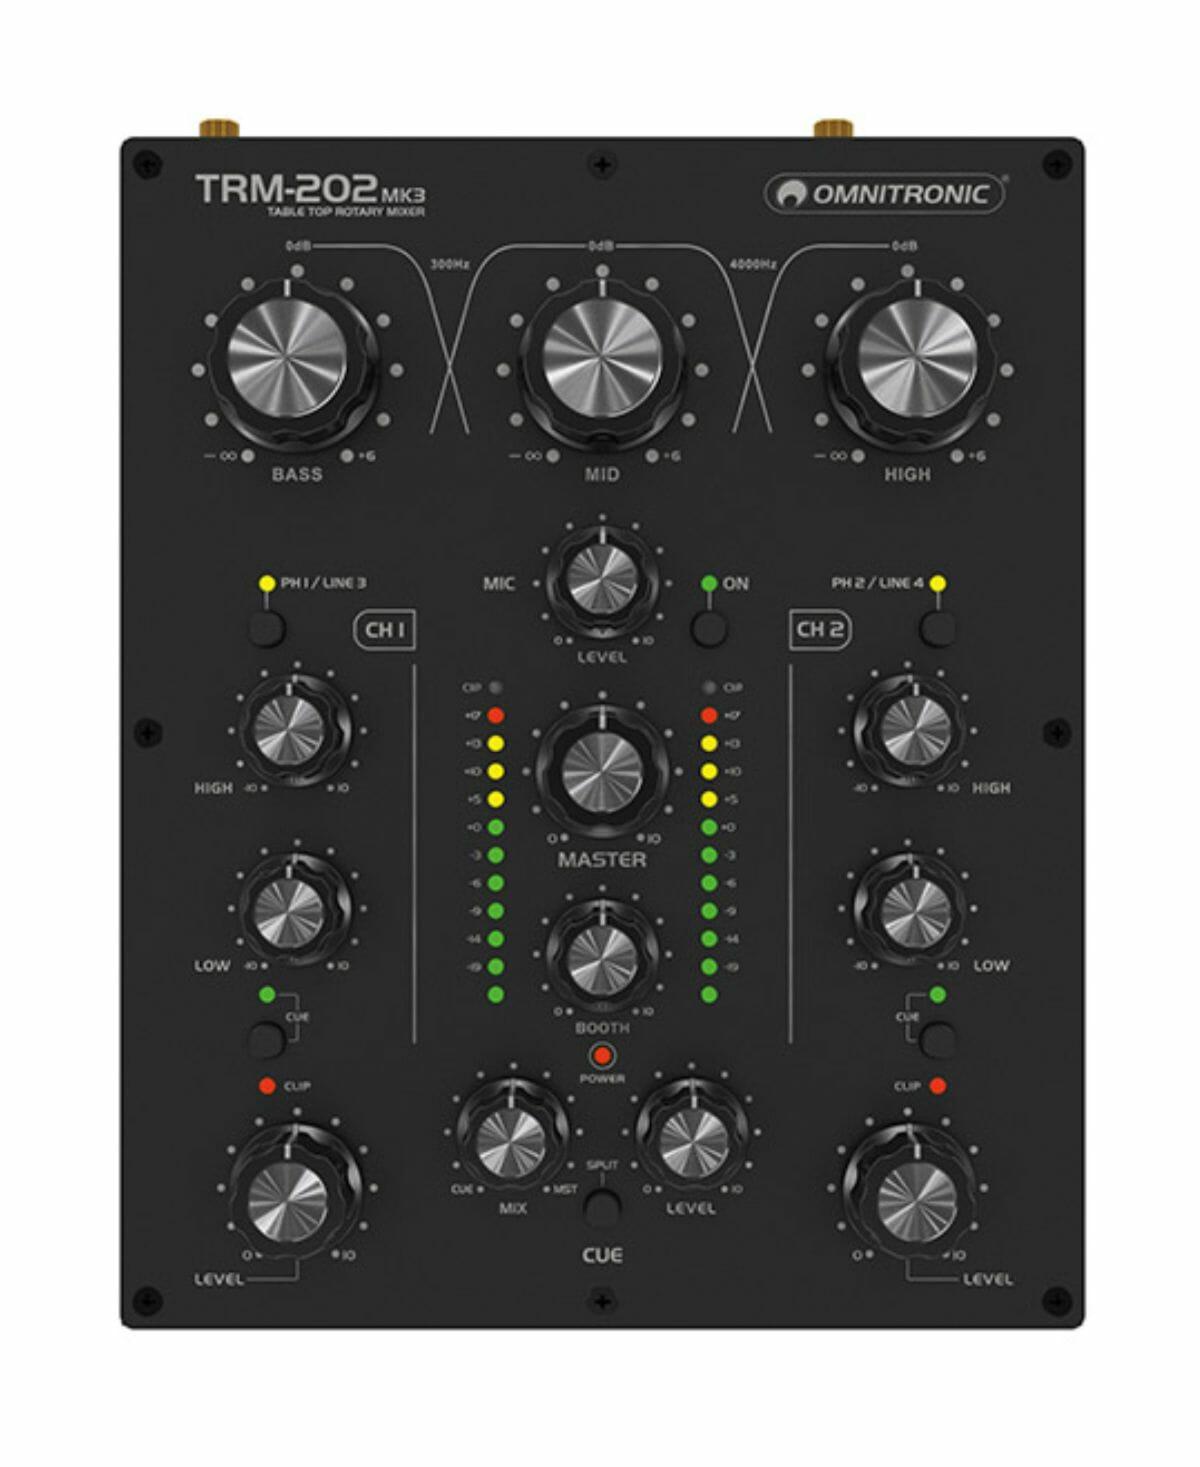 TRM-303MK3